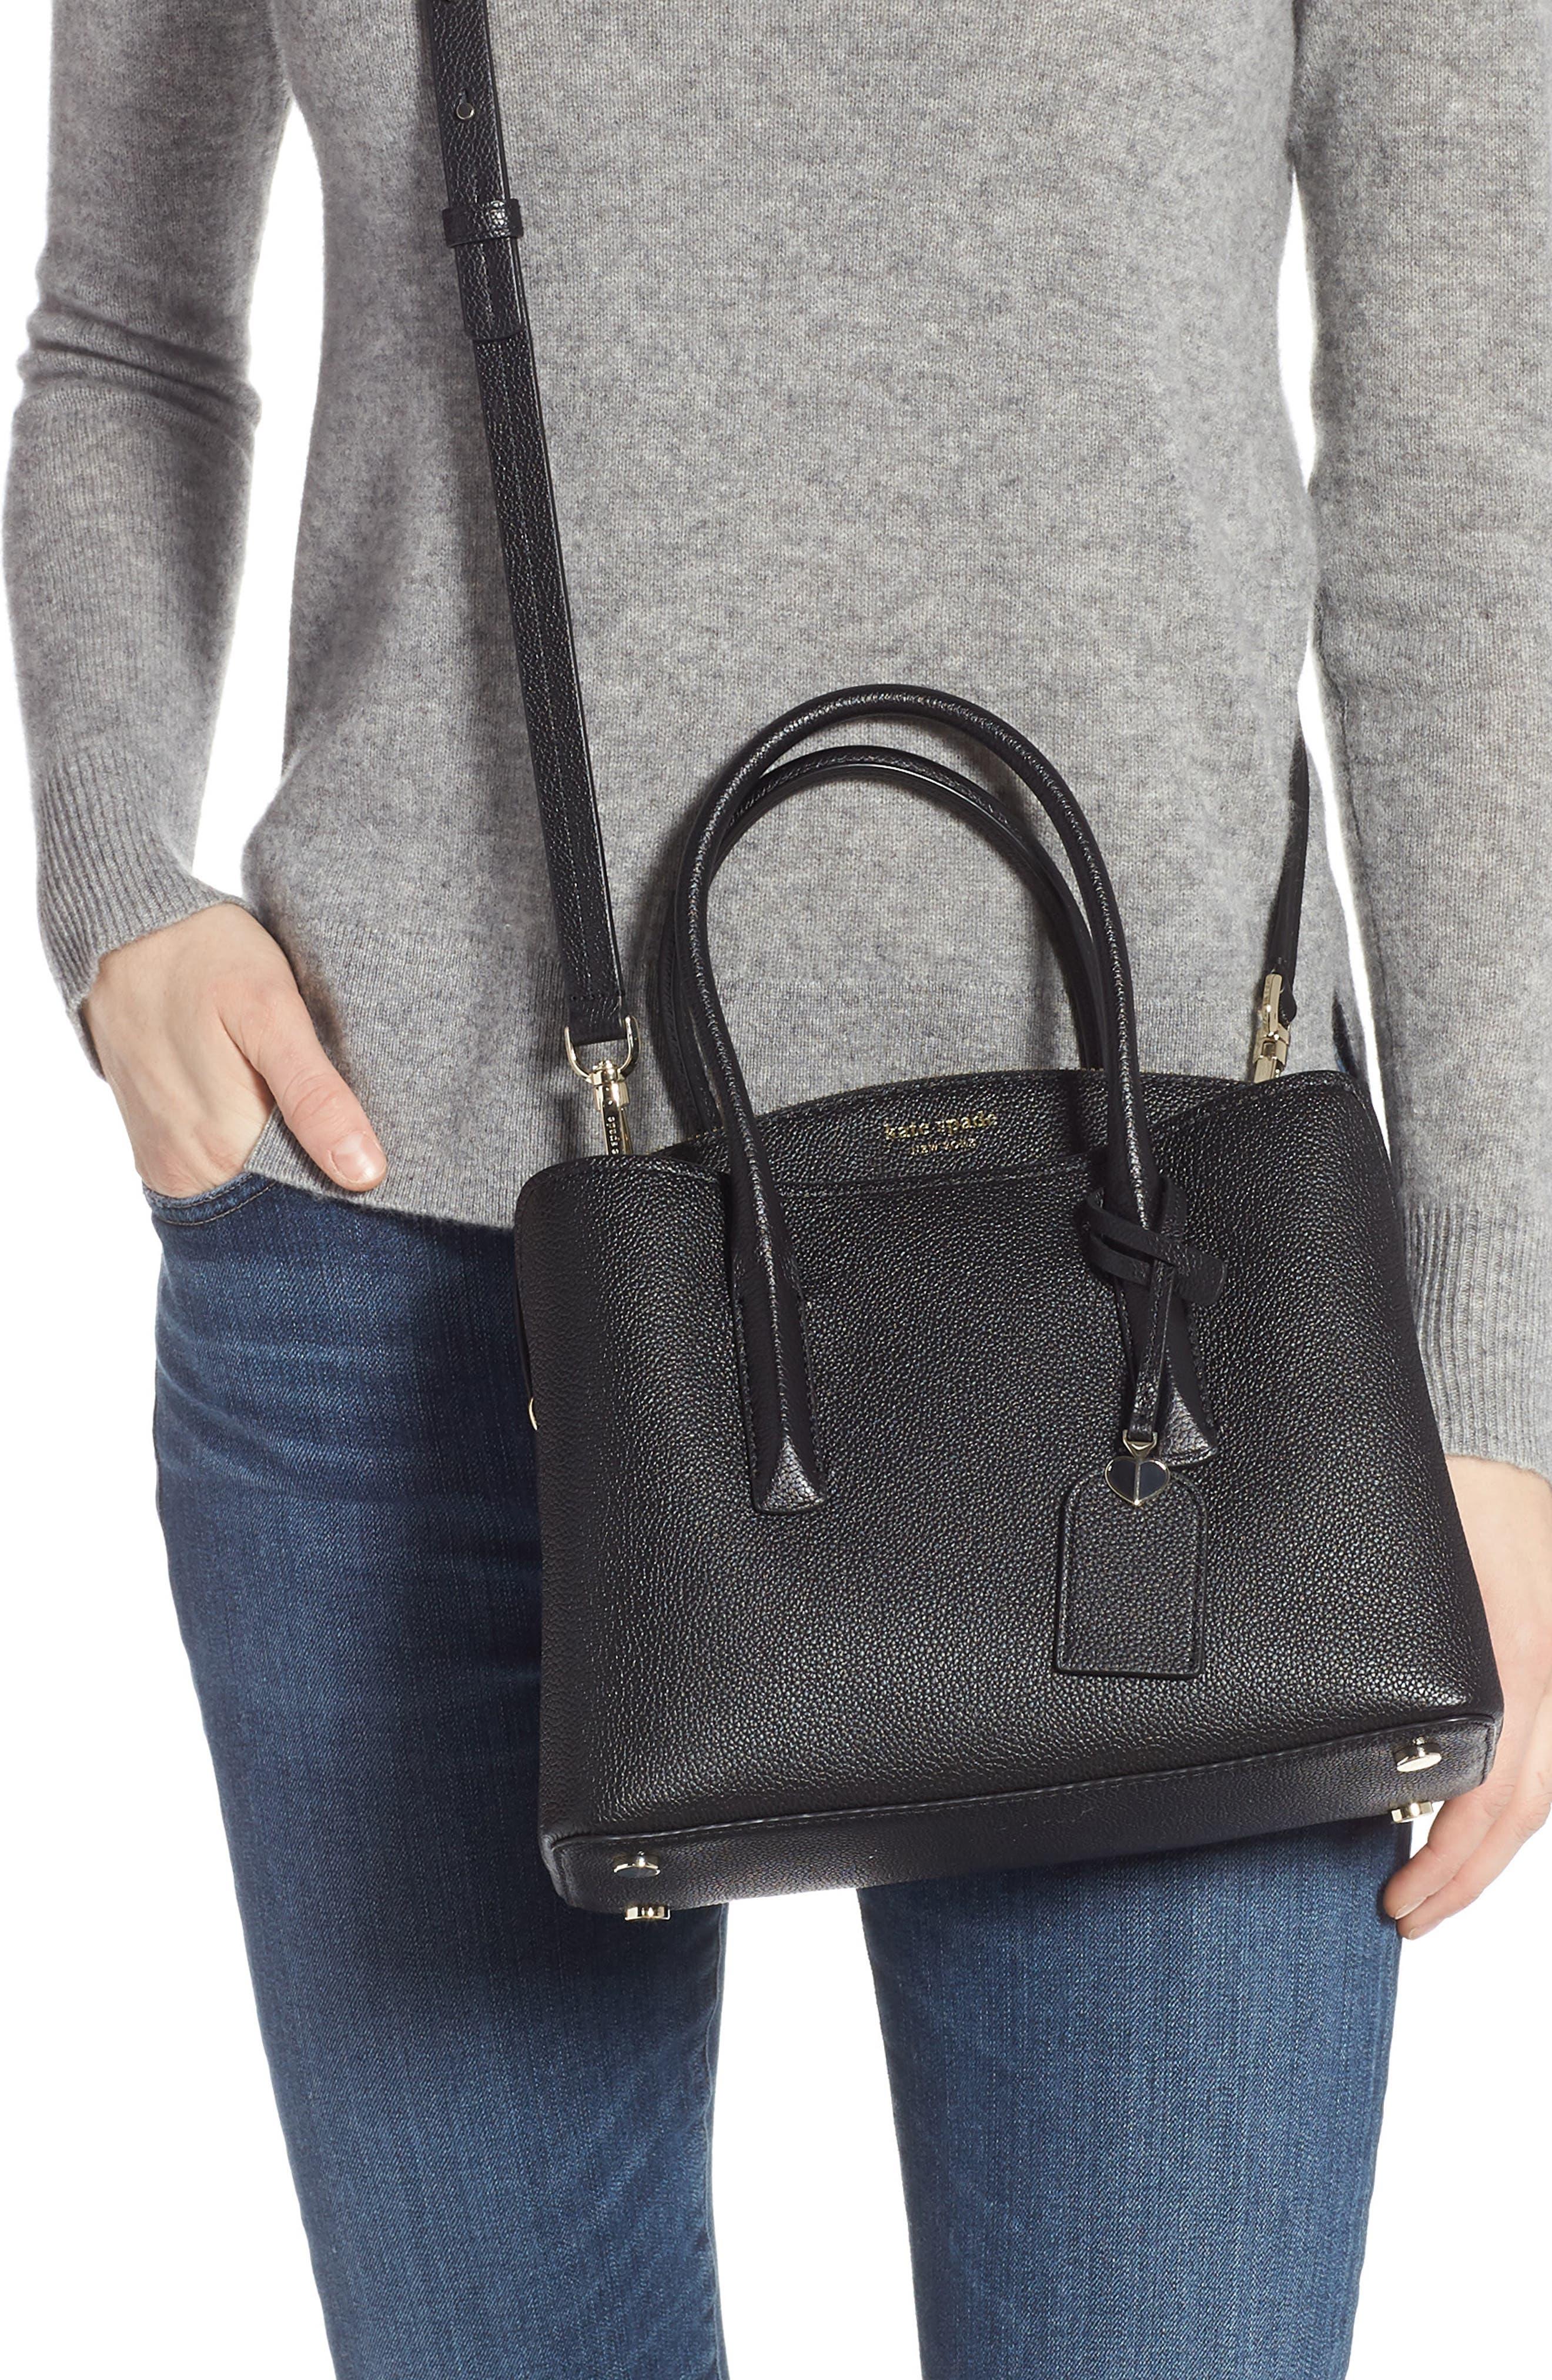 KATE SPADE NEW YORK, medium margaux leather satchel, Alternate thumbnail 2, color, BLACK